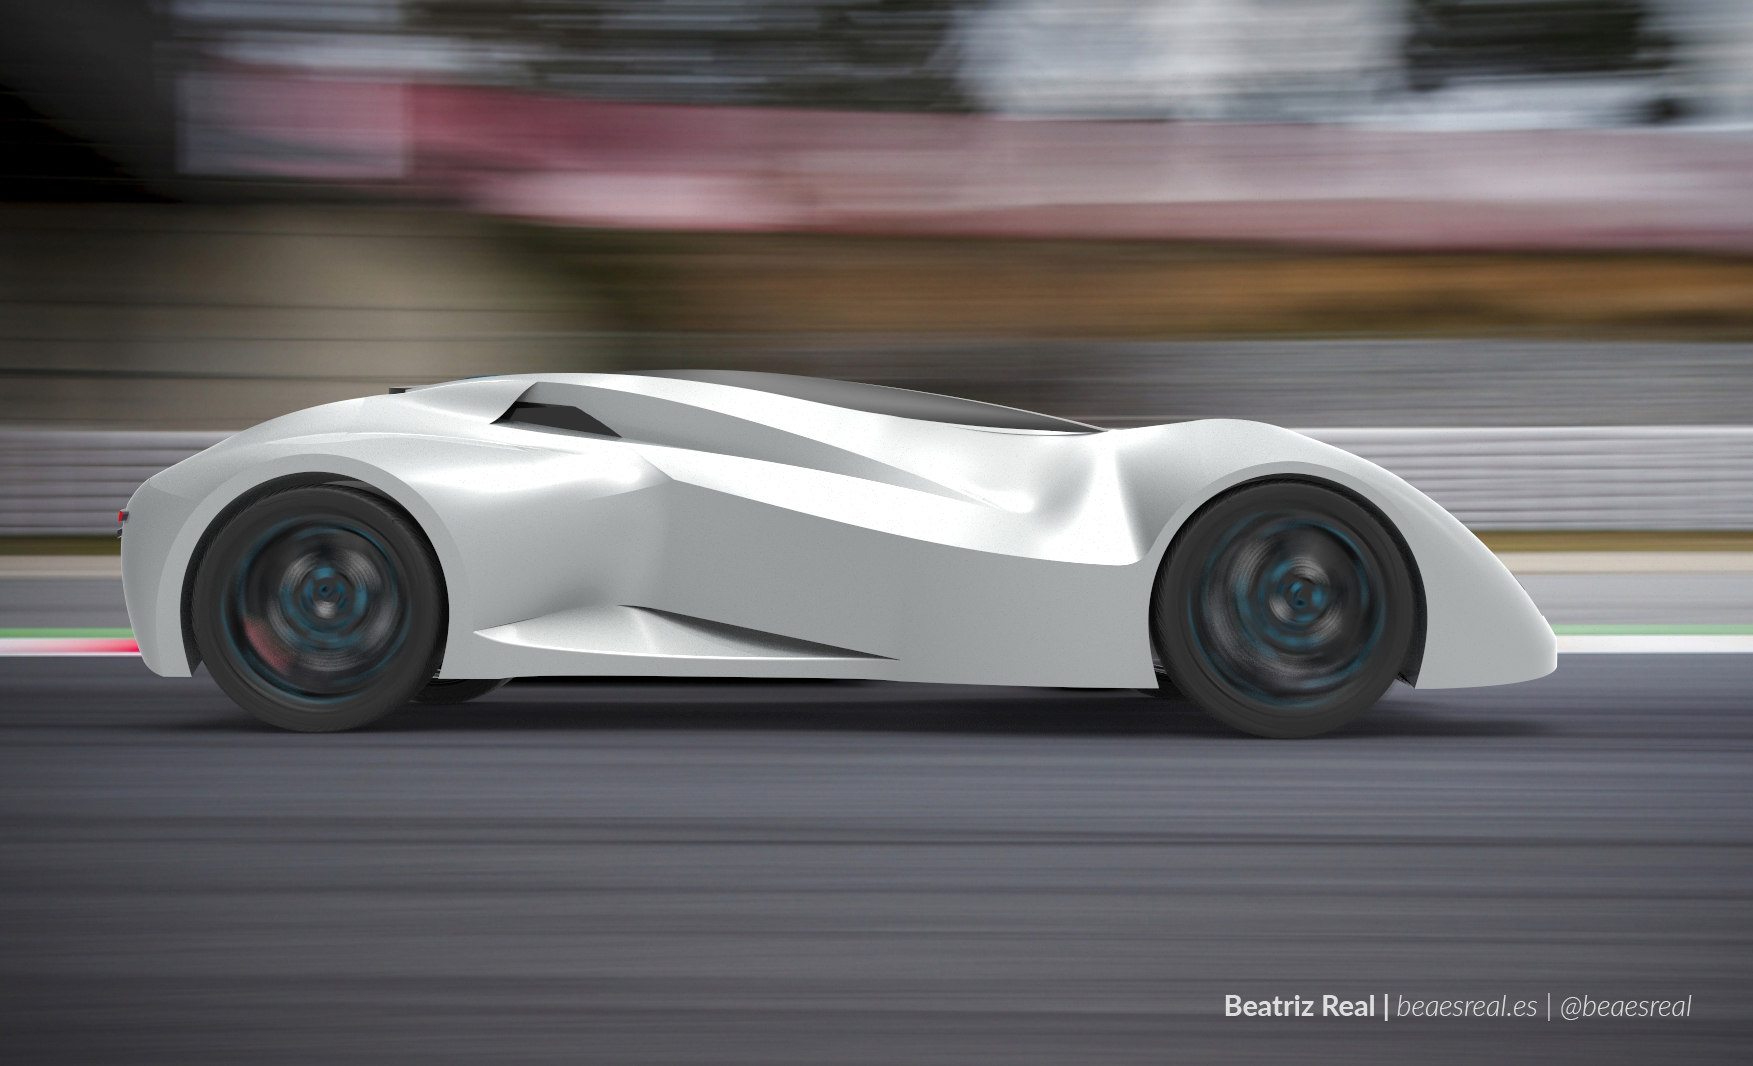 WB-CAR-Beaesreal-05